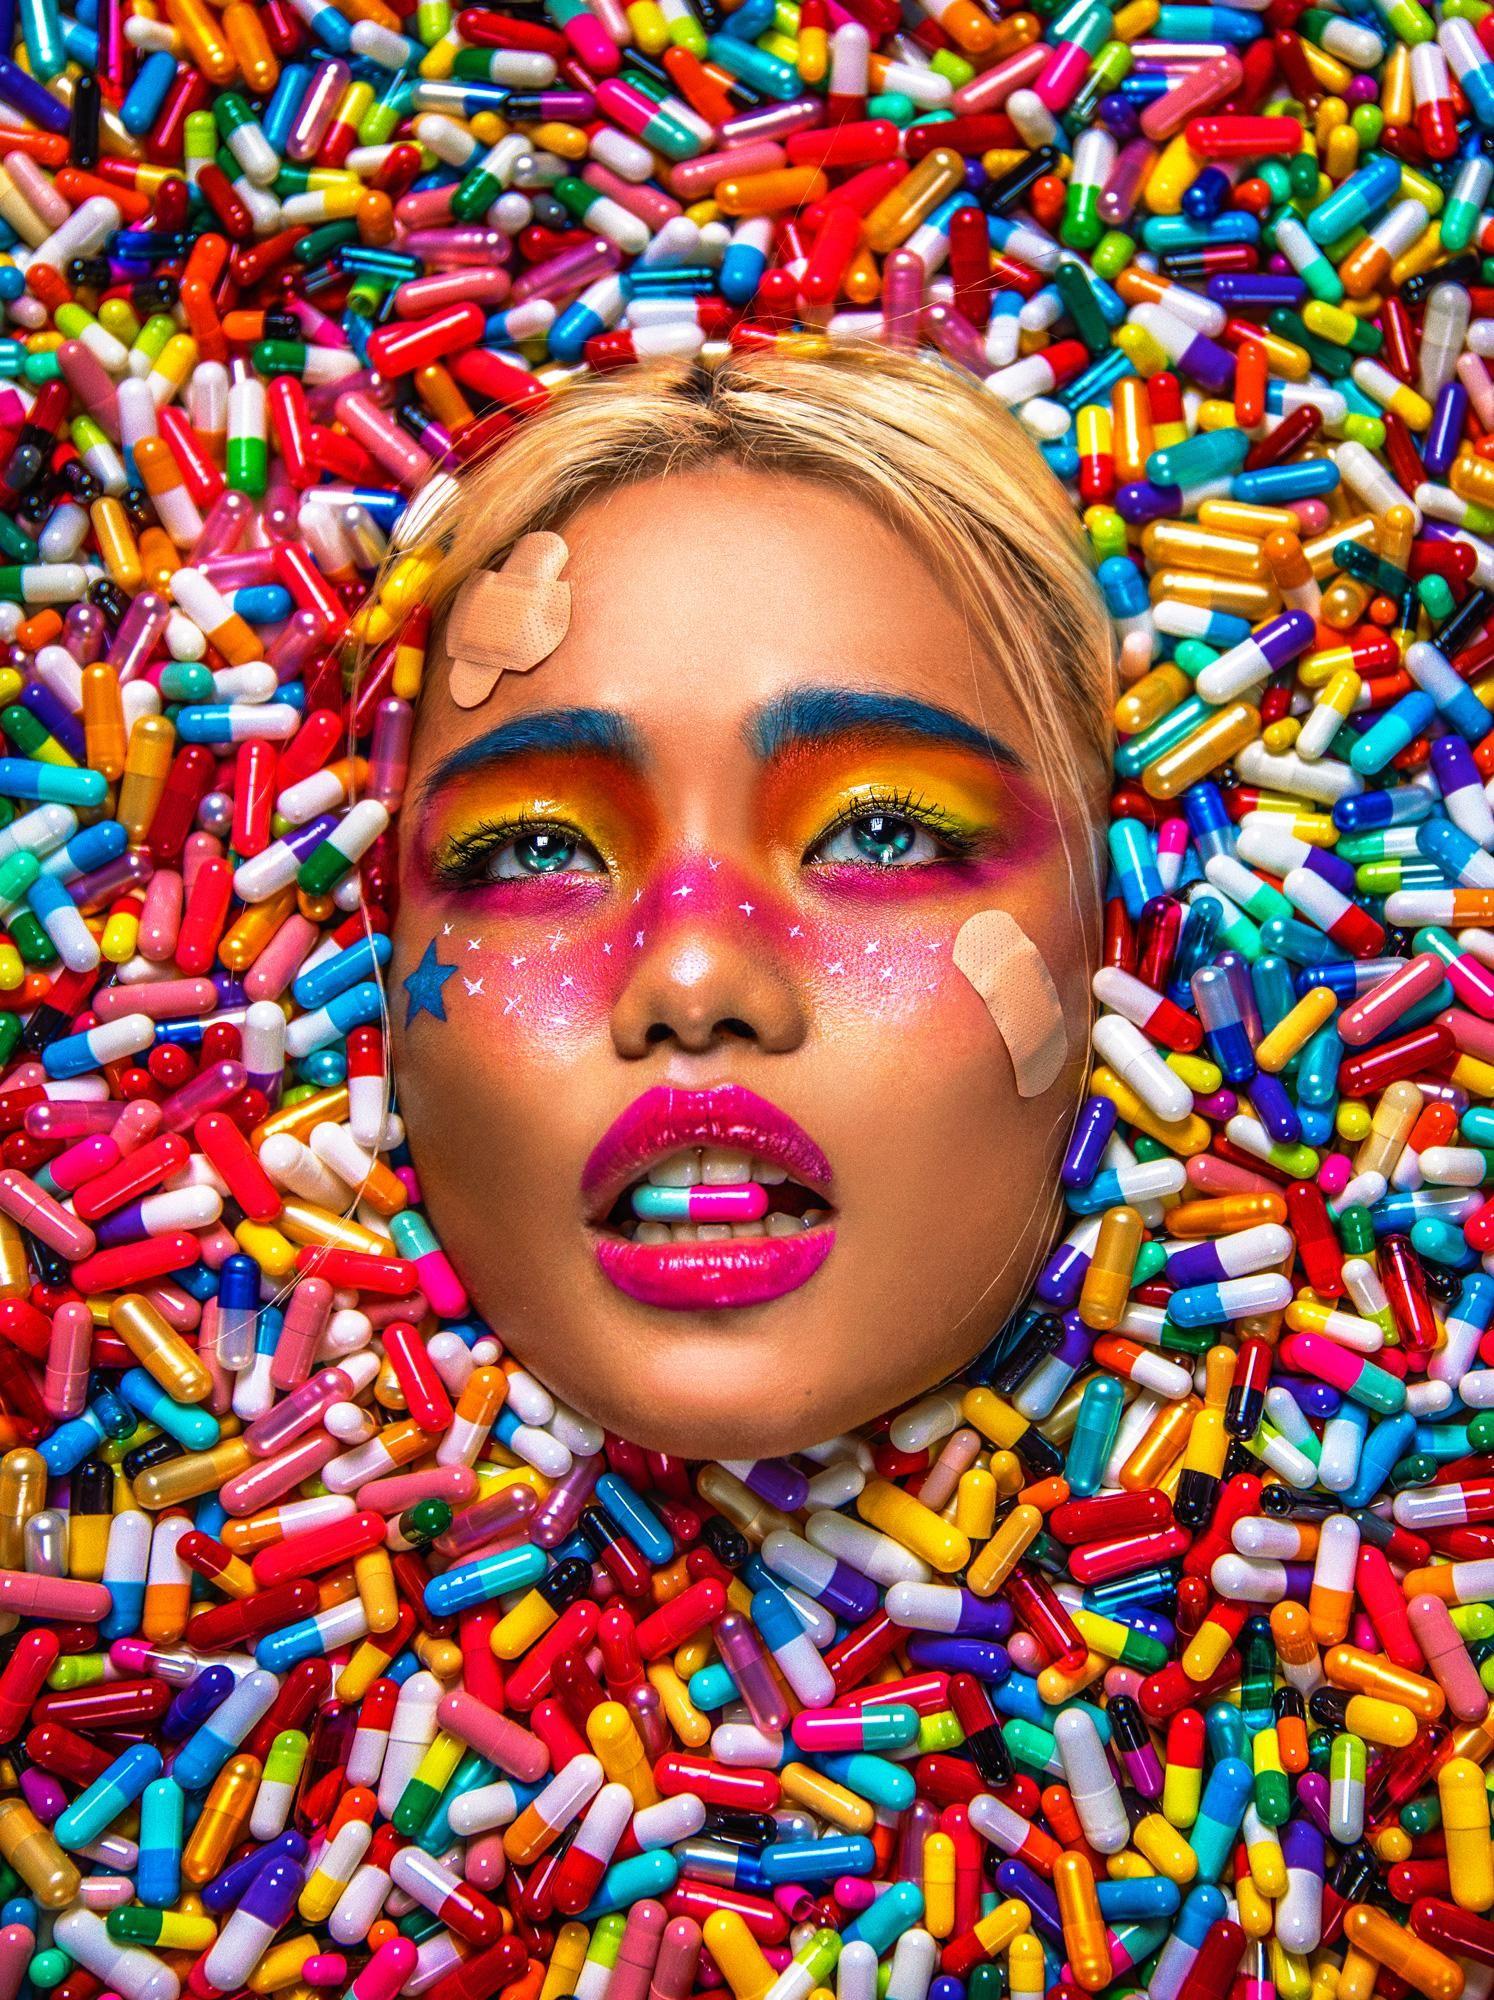 Haris Nukem: The Fashion Photographer Capturing the Human Spirit | Art | Culture | Luxury London